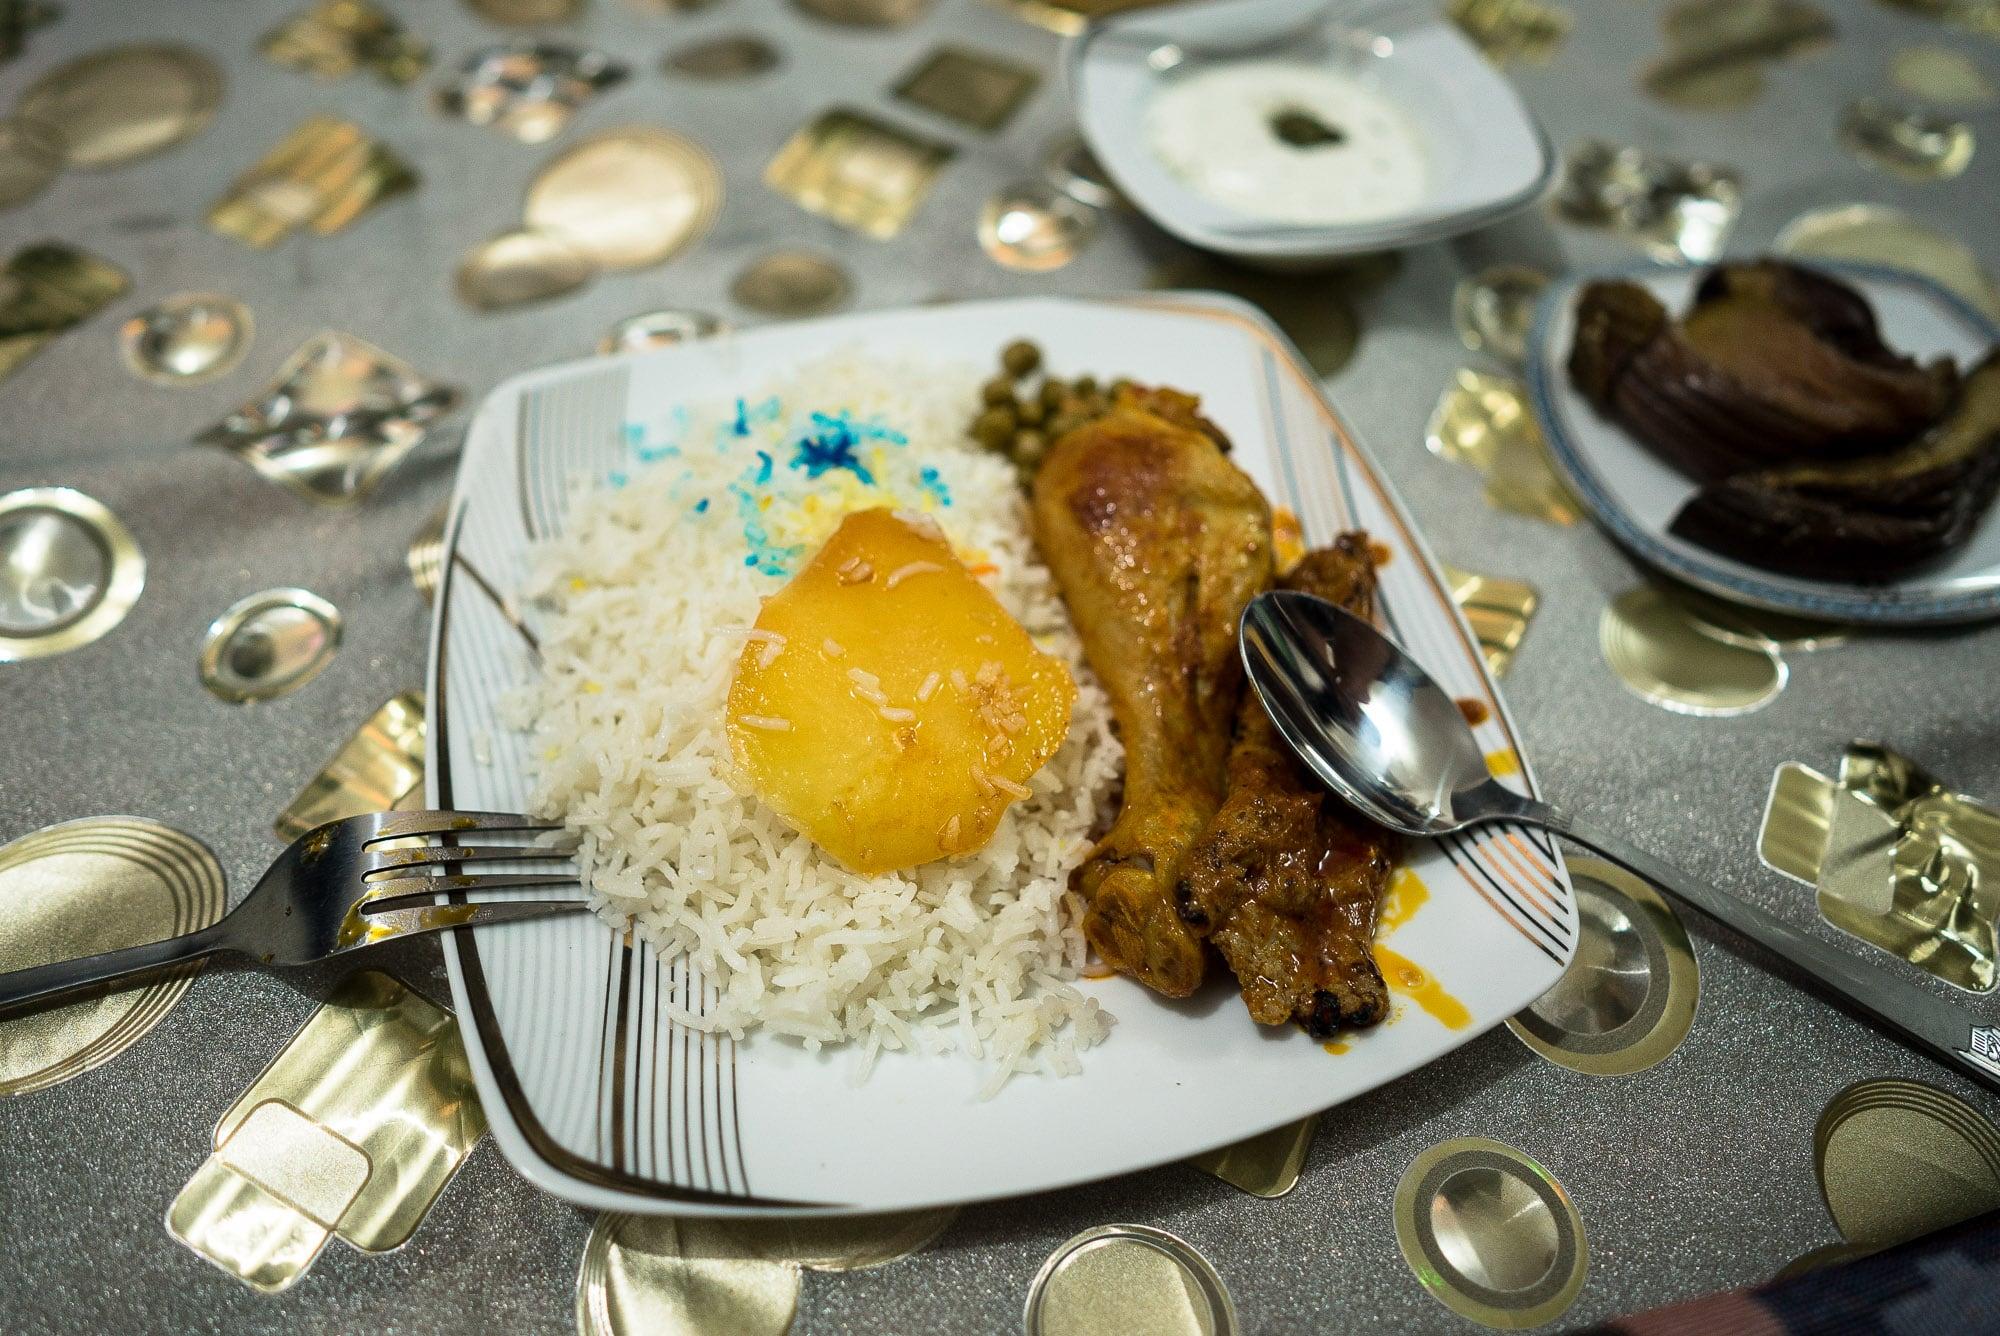 dinner in Mahdi's house